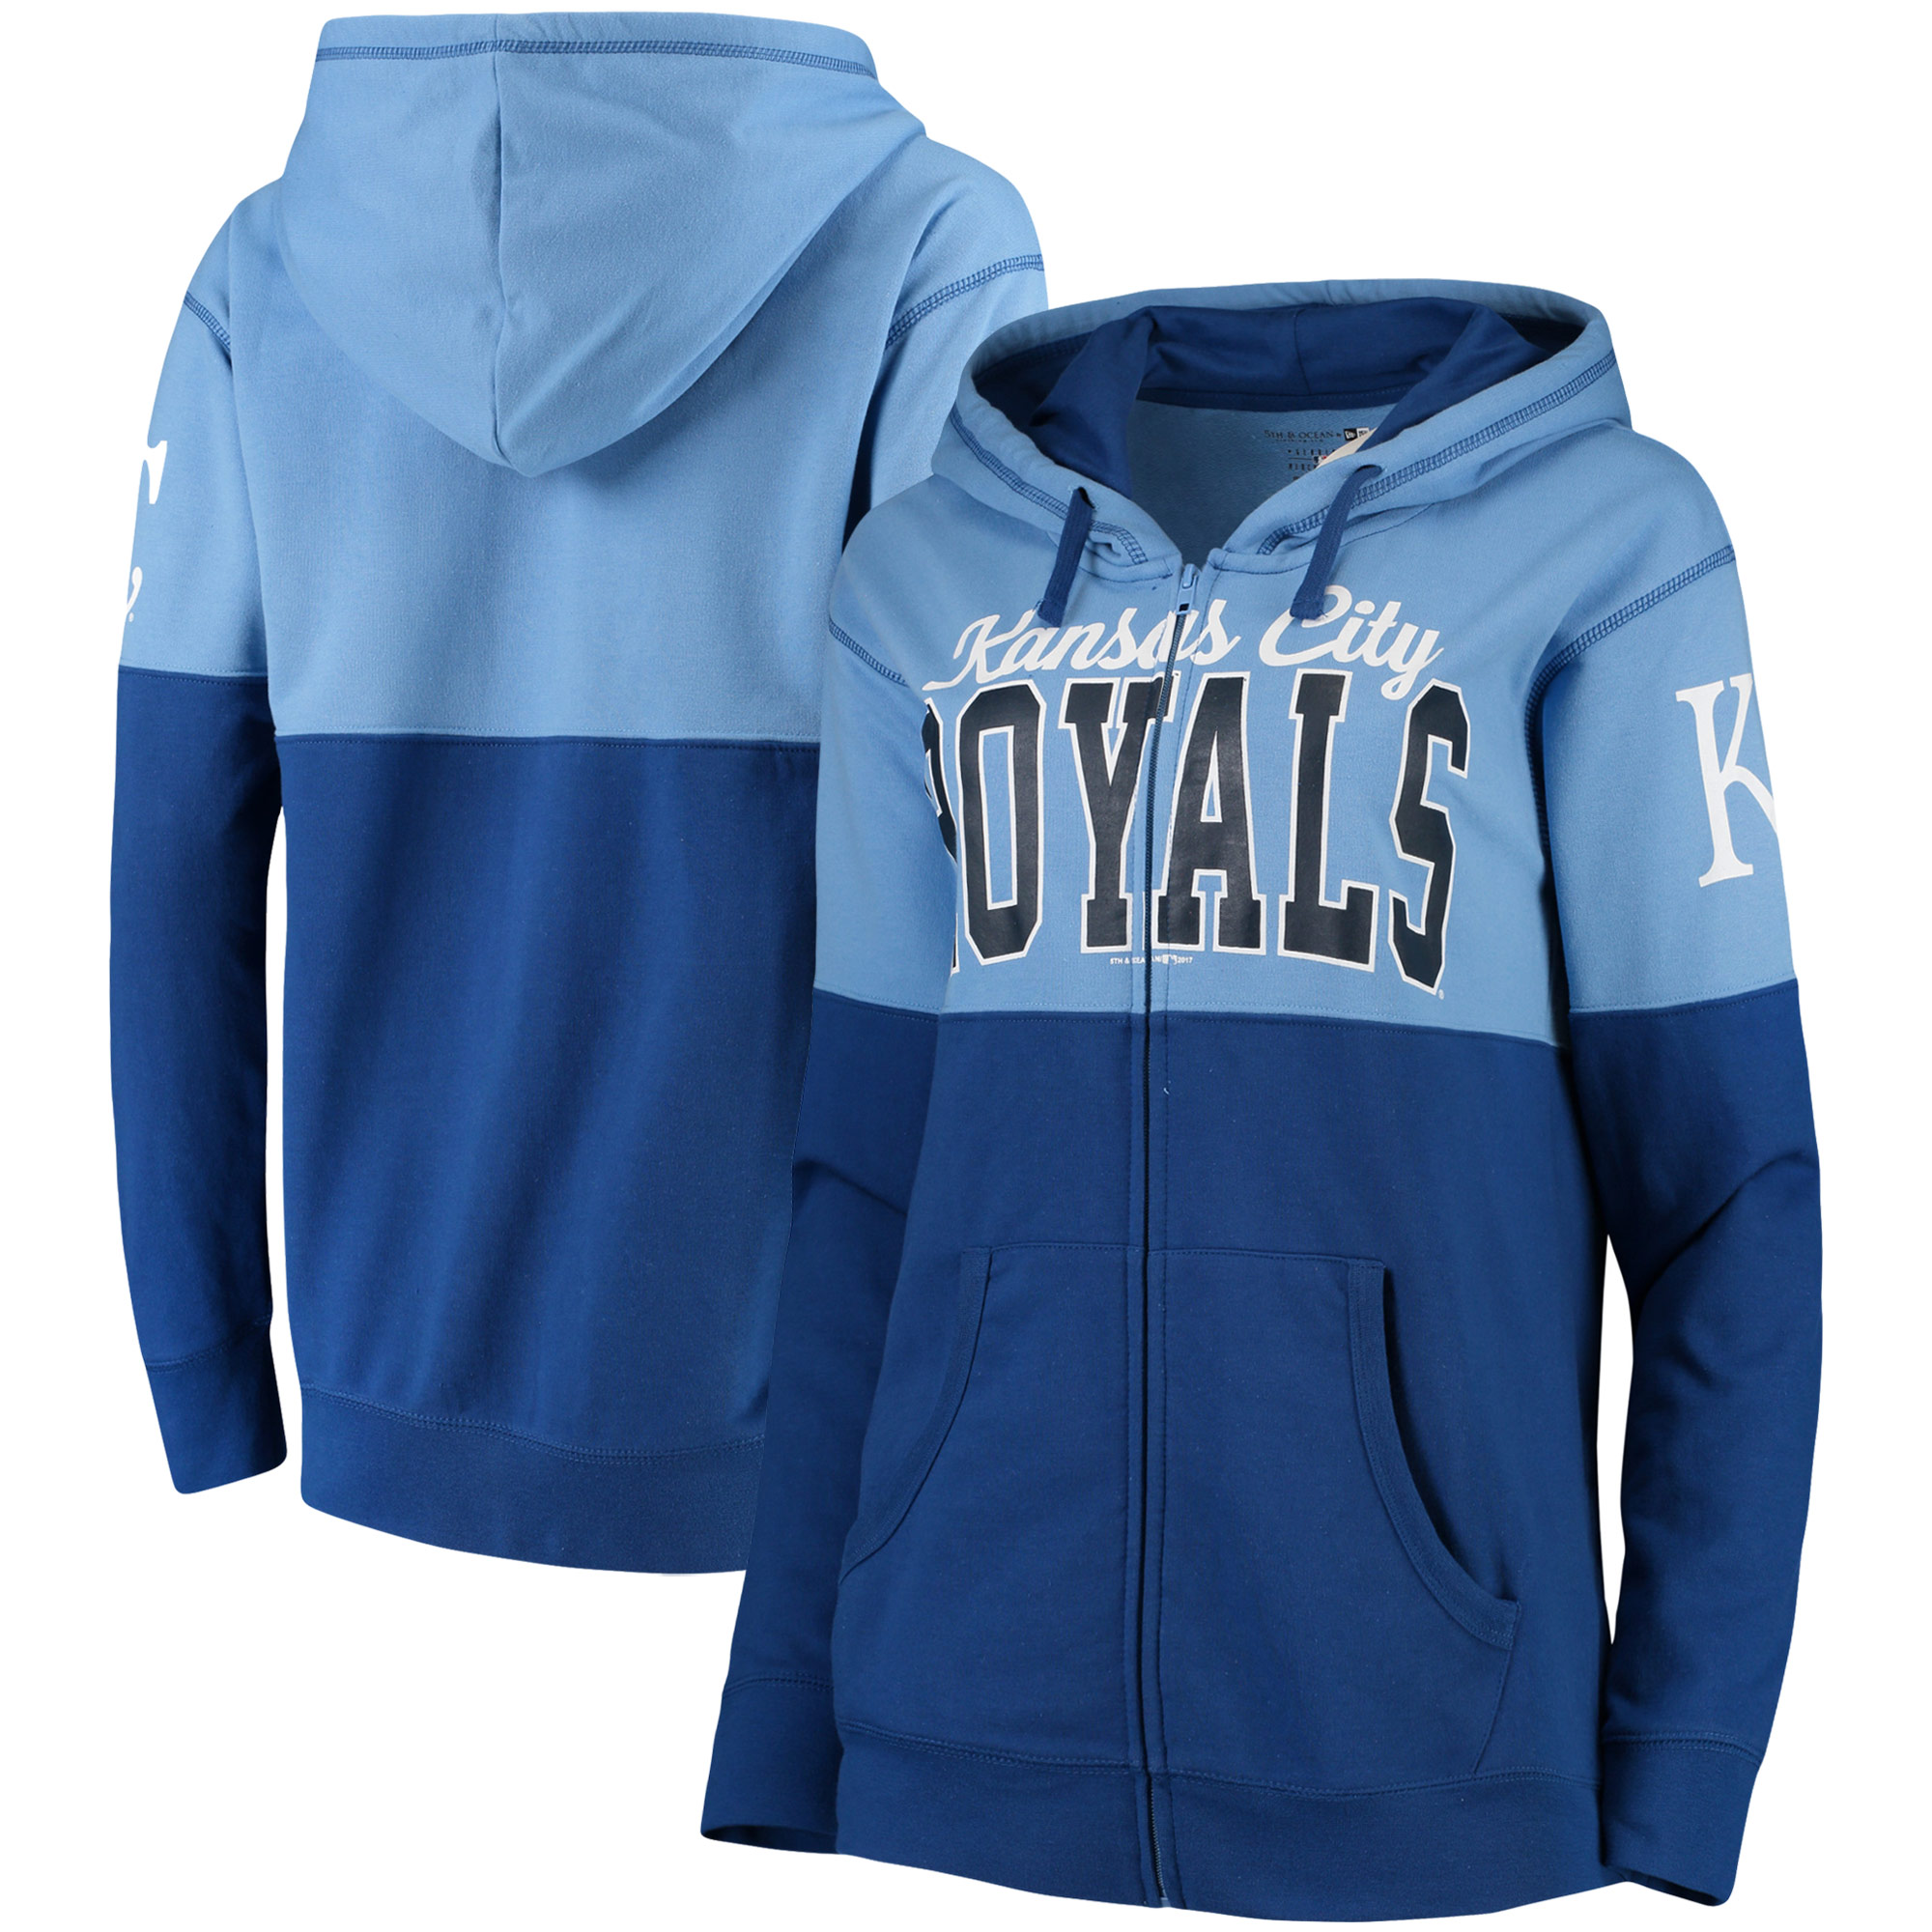 Kansas City Royals 5th & Ocean by New Era Women's Full-Zip Hoodie - Royal/Light Blue